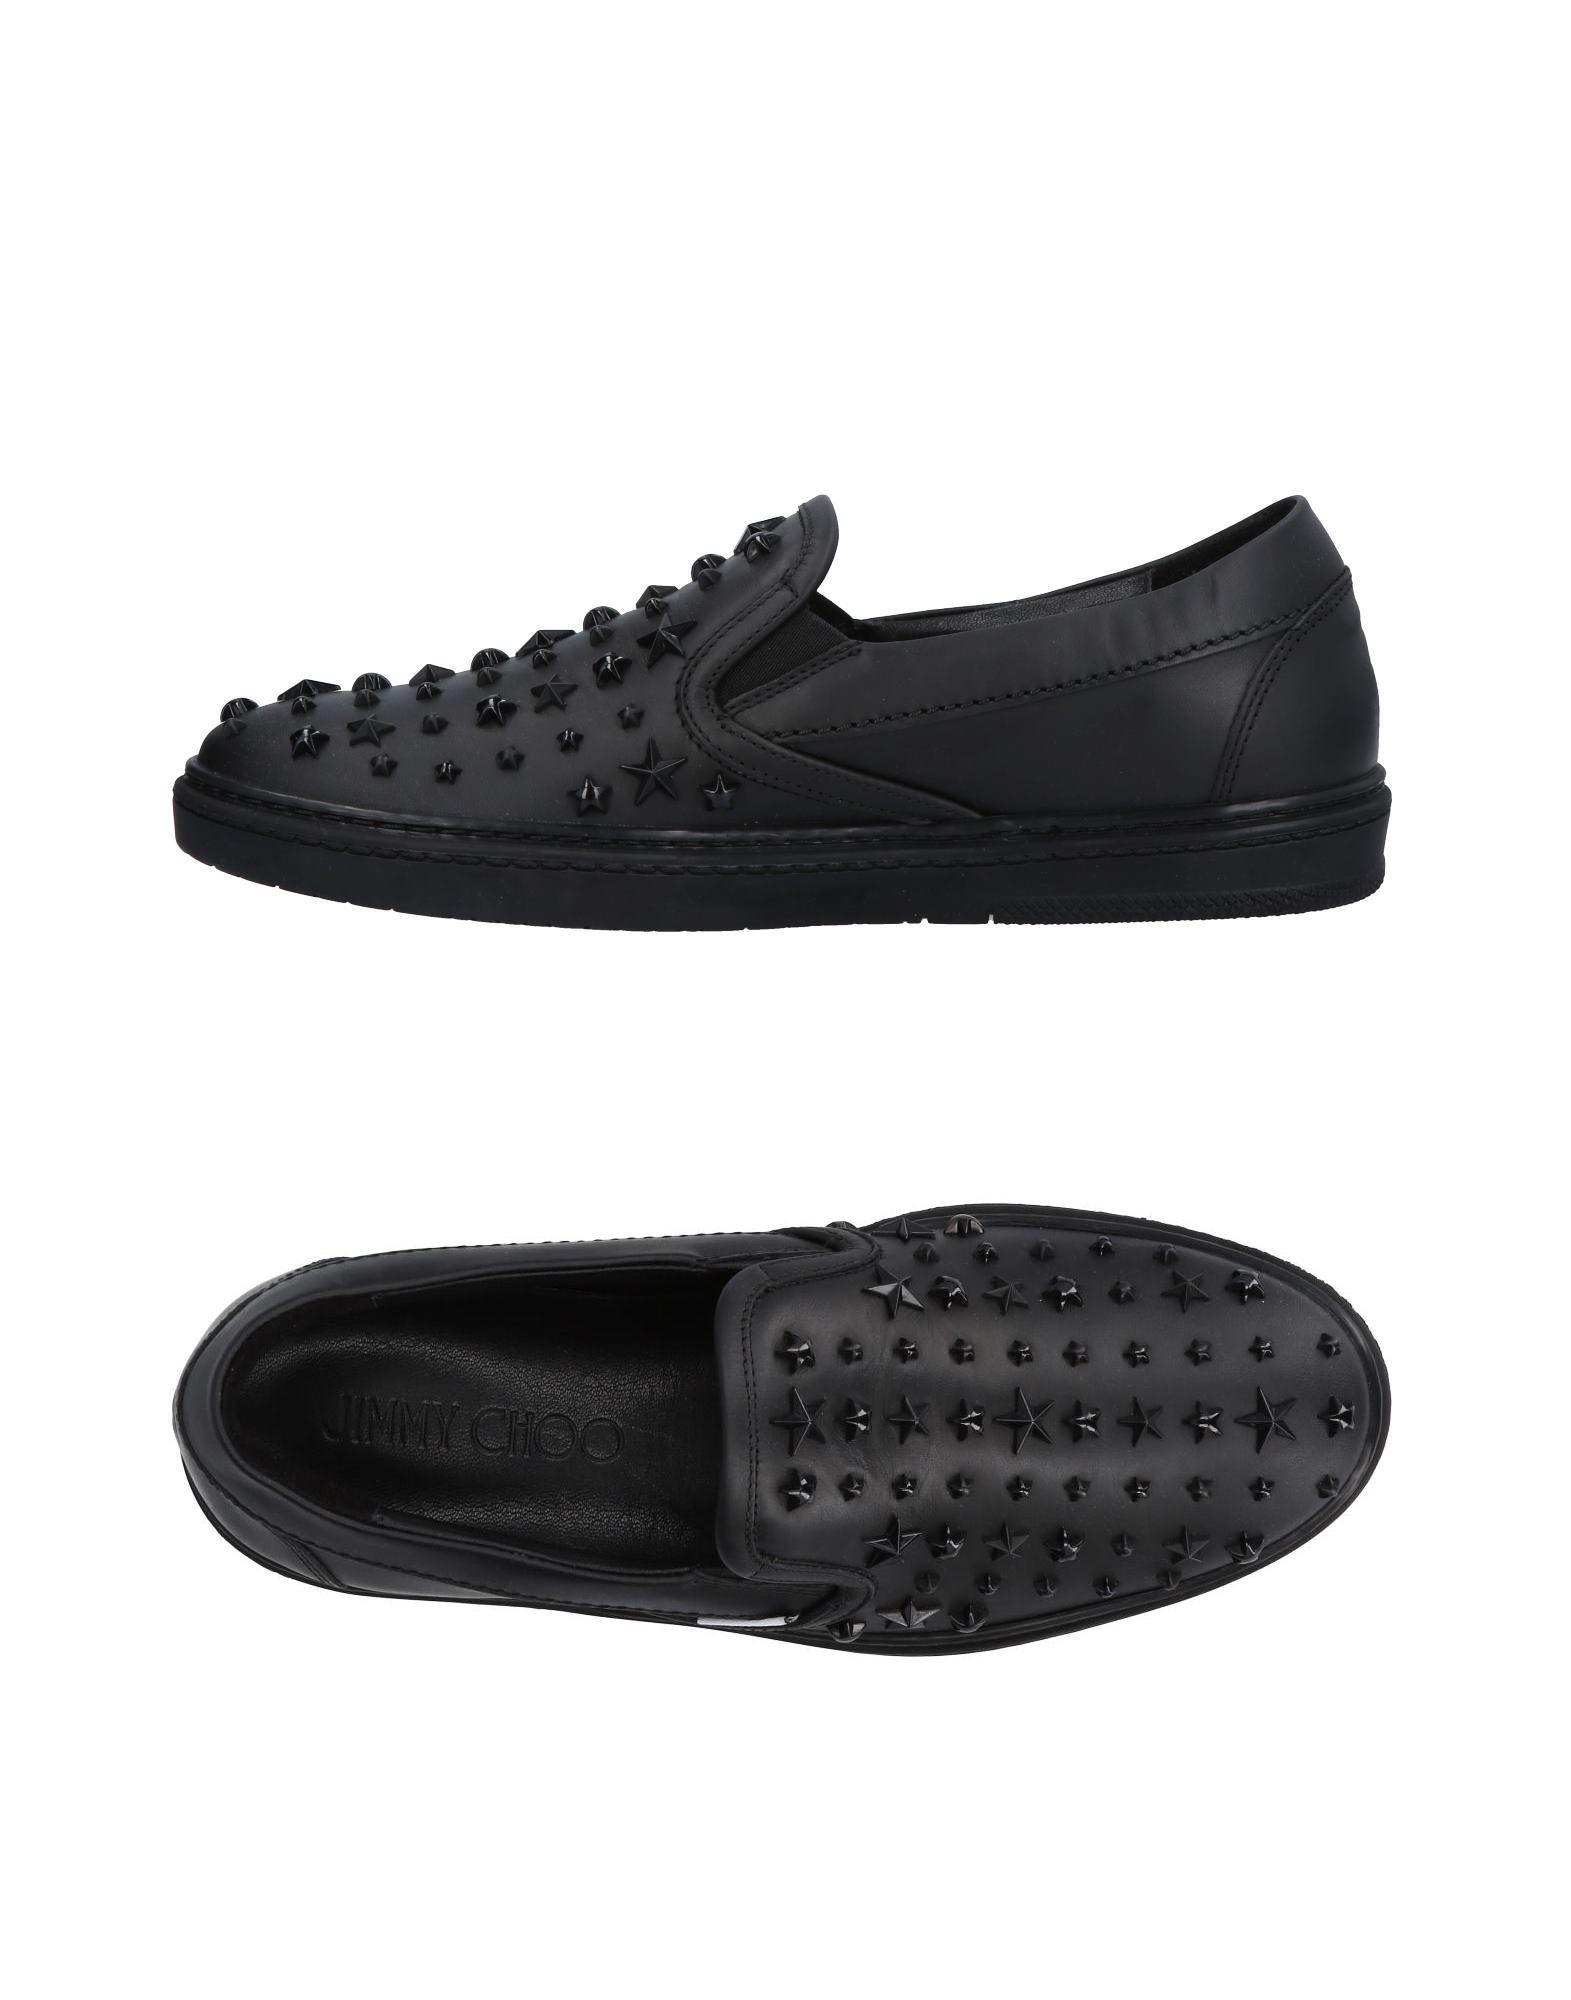 Jimmy Choo Sneakers Herren  11462597RH Gute Qualität beliebte Schuhe